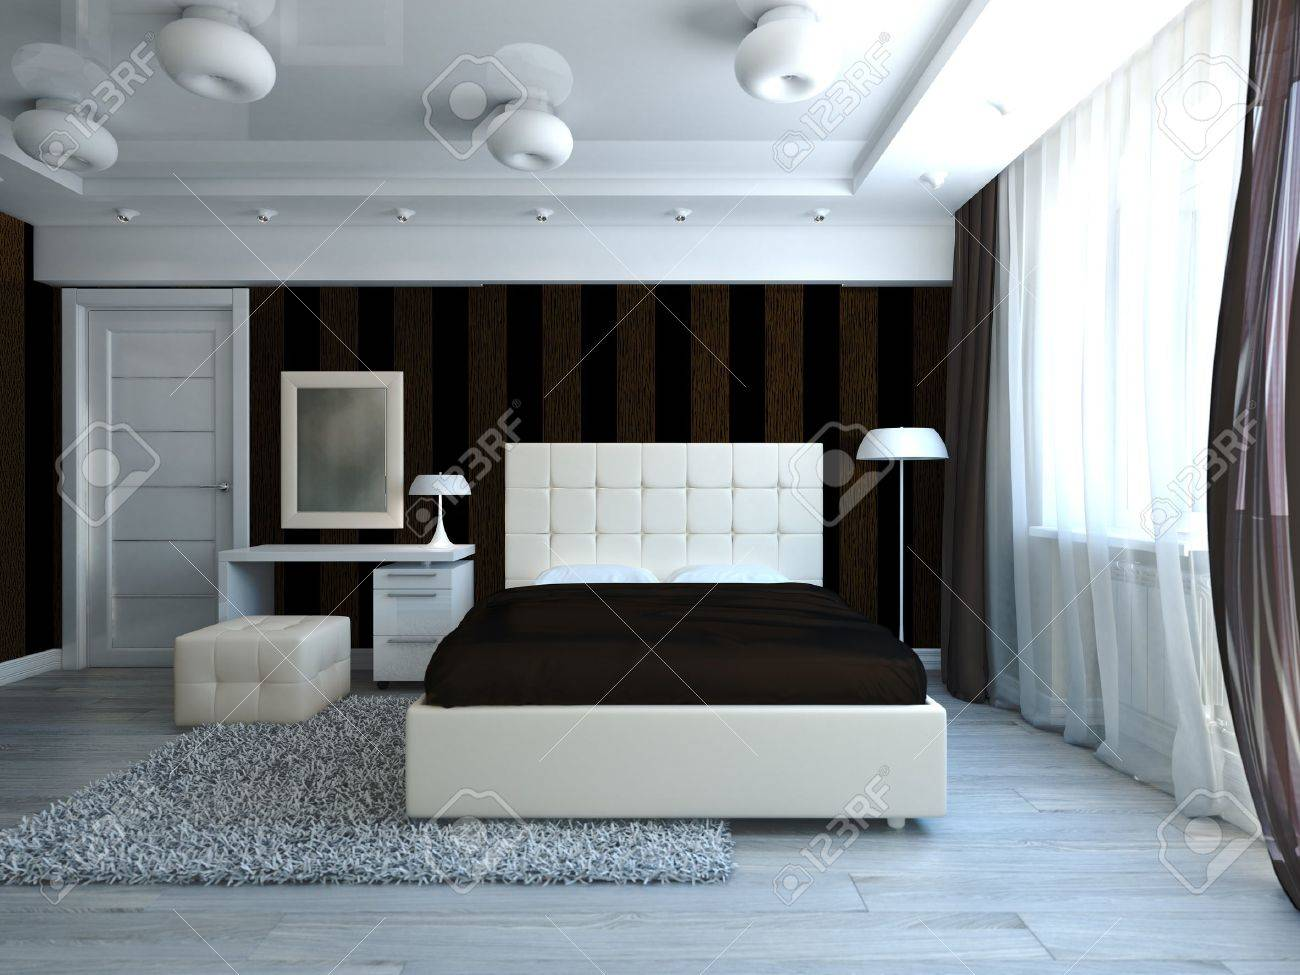 Moderne stijl slaapkamer interieur royalty vrije foto, plaatjes ...